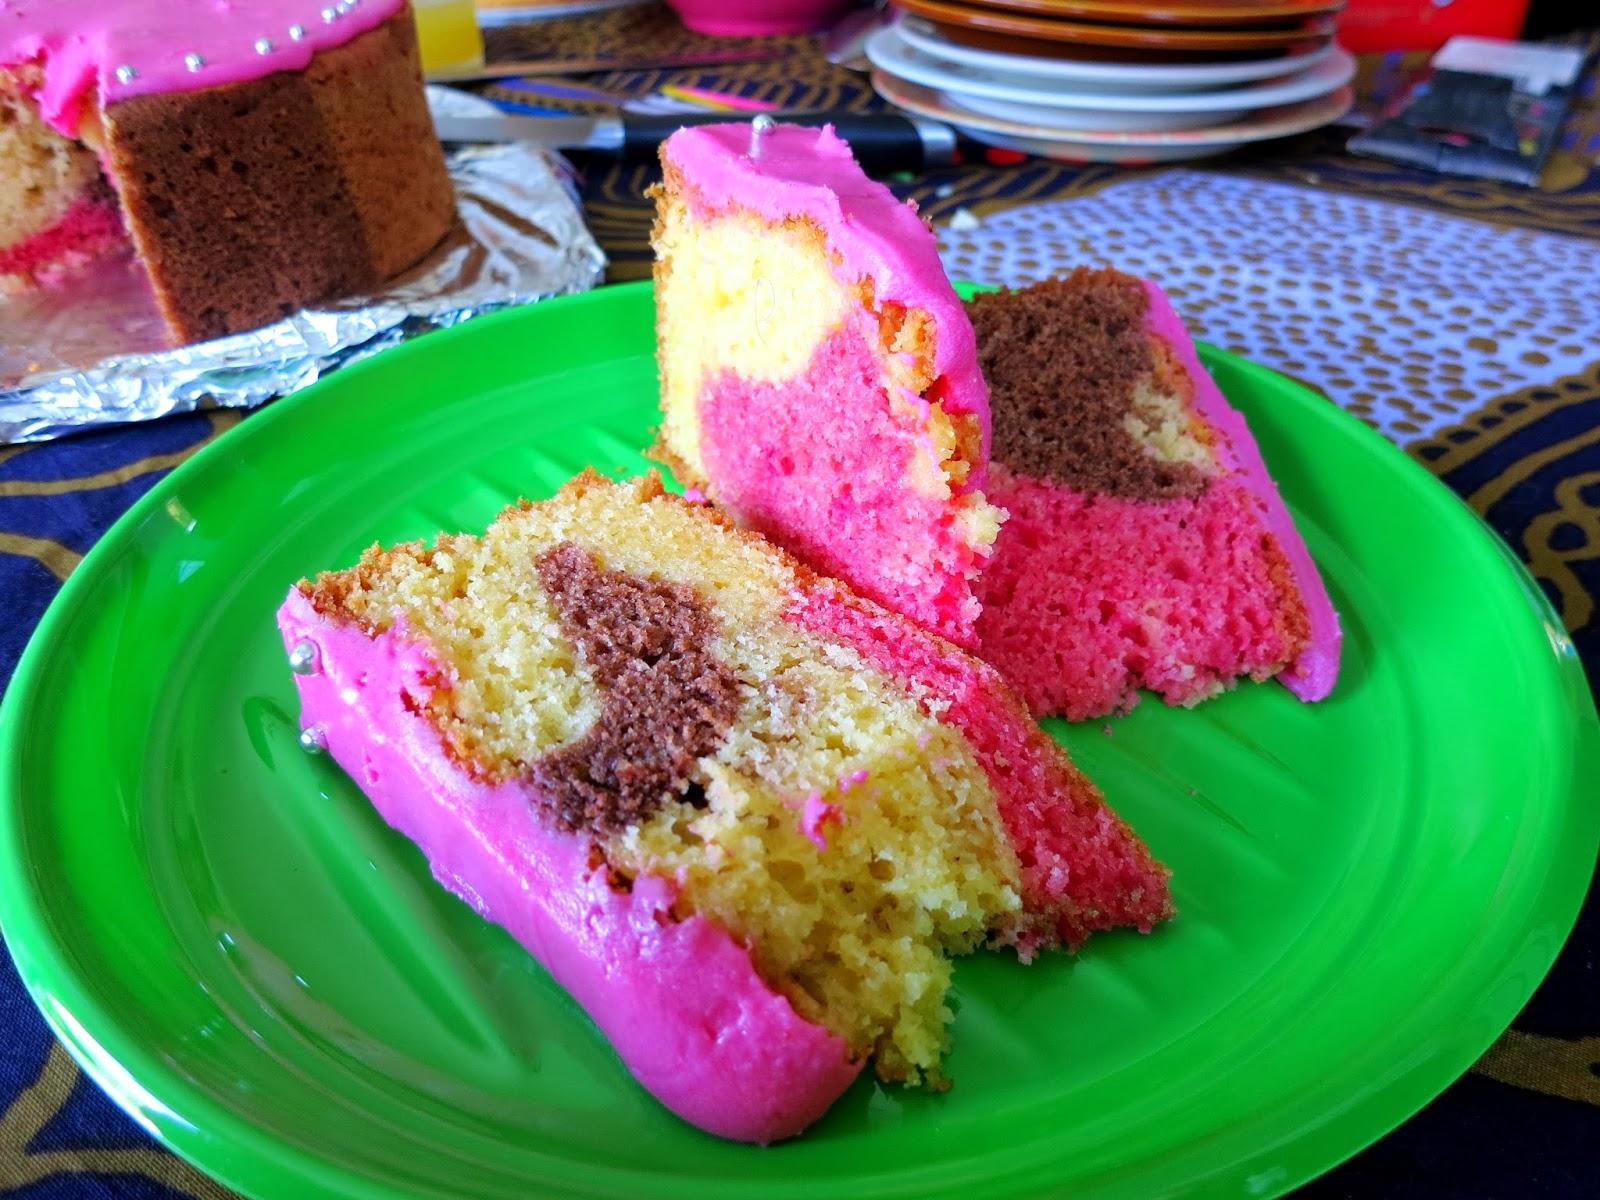 Marble cake recipe 3 eggs